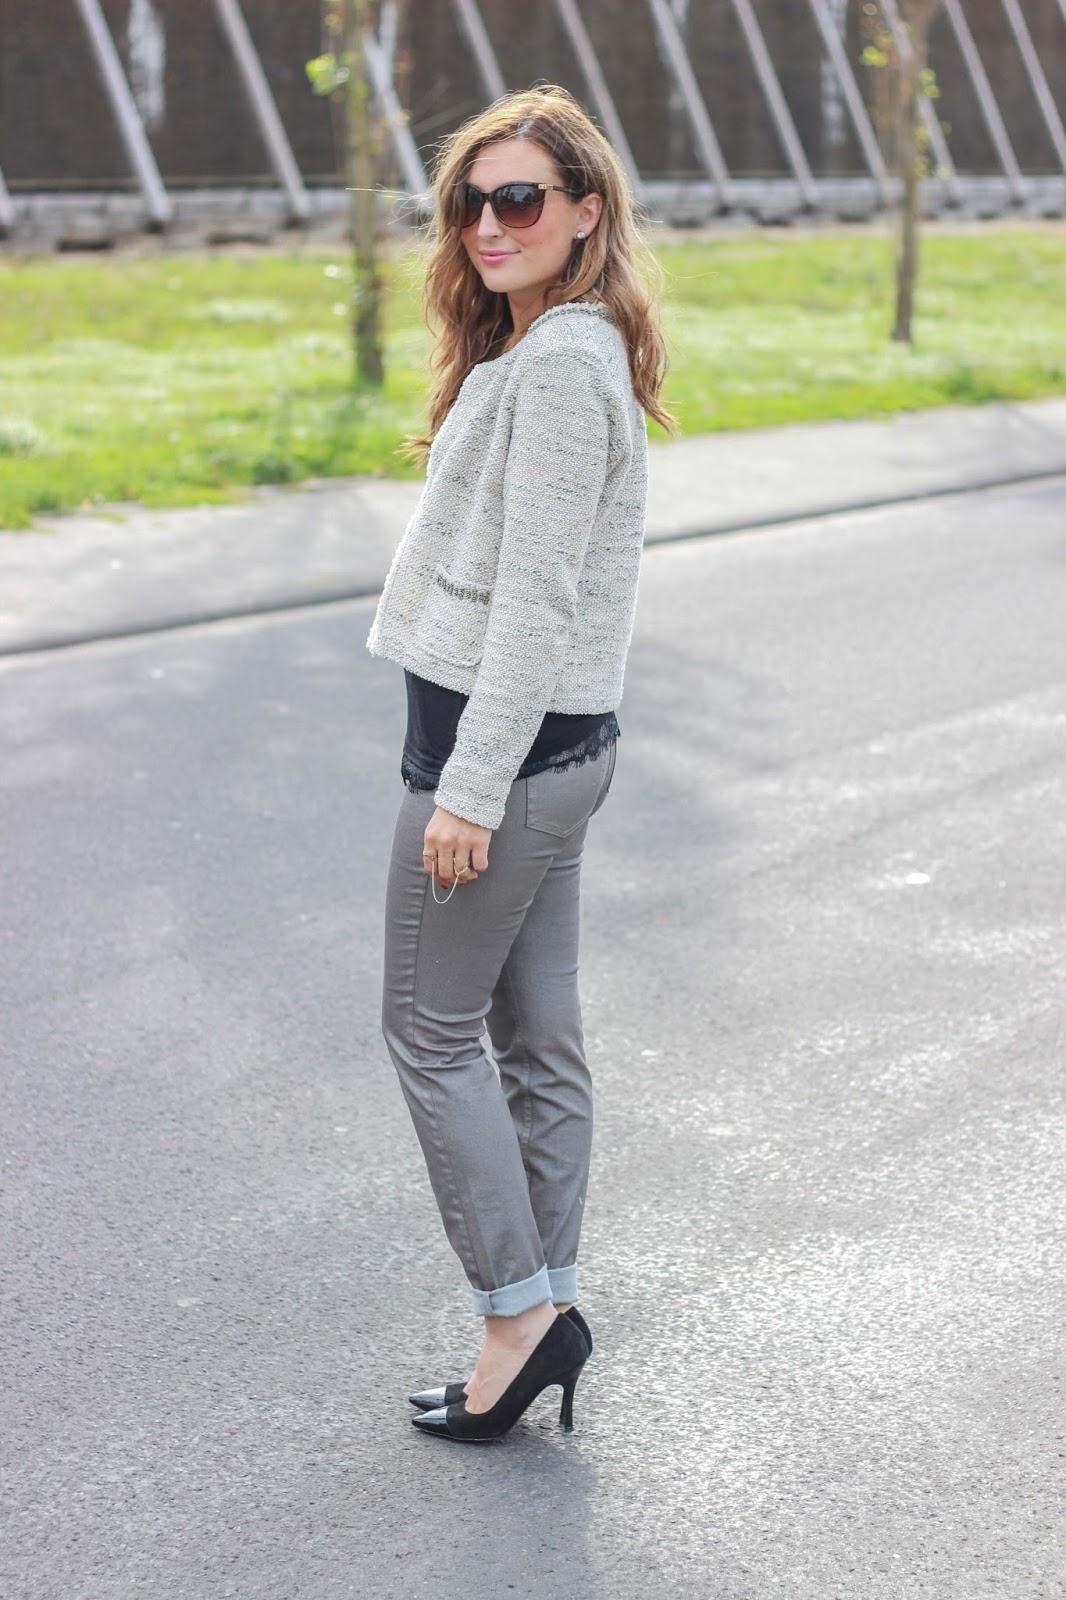 Outfitinspiration - Fashionblogger - Frankfurt Faschionblogger - Lifestyleblogger - Fashionblogger aus Deutschland - Oscar de la Renta Sonnenbrille - Taifun Fashion - Outfit Gerry Weber- Silberne Hose kombinieren - German Fashionblog